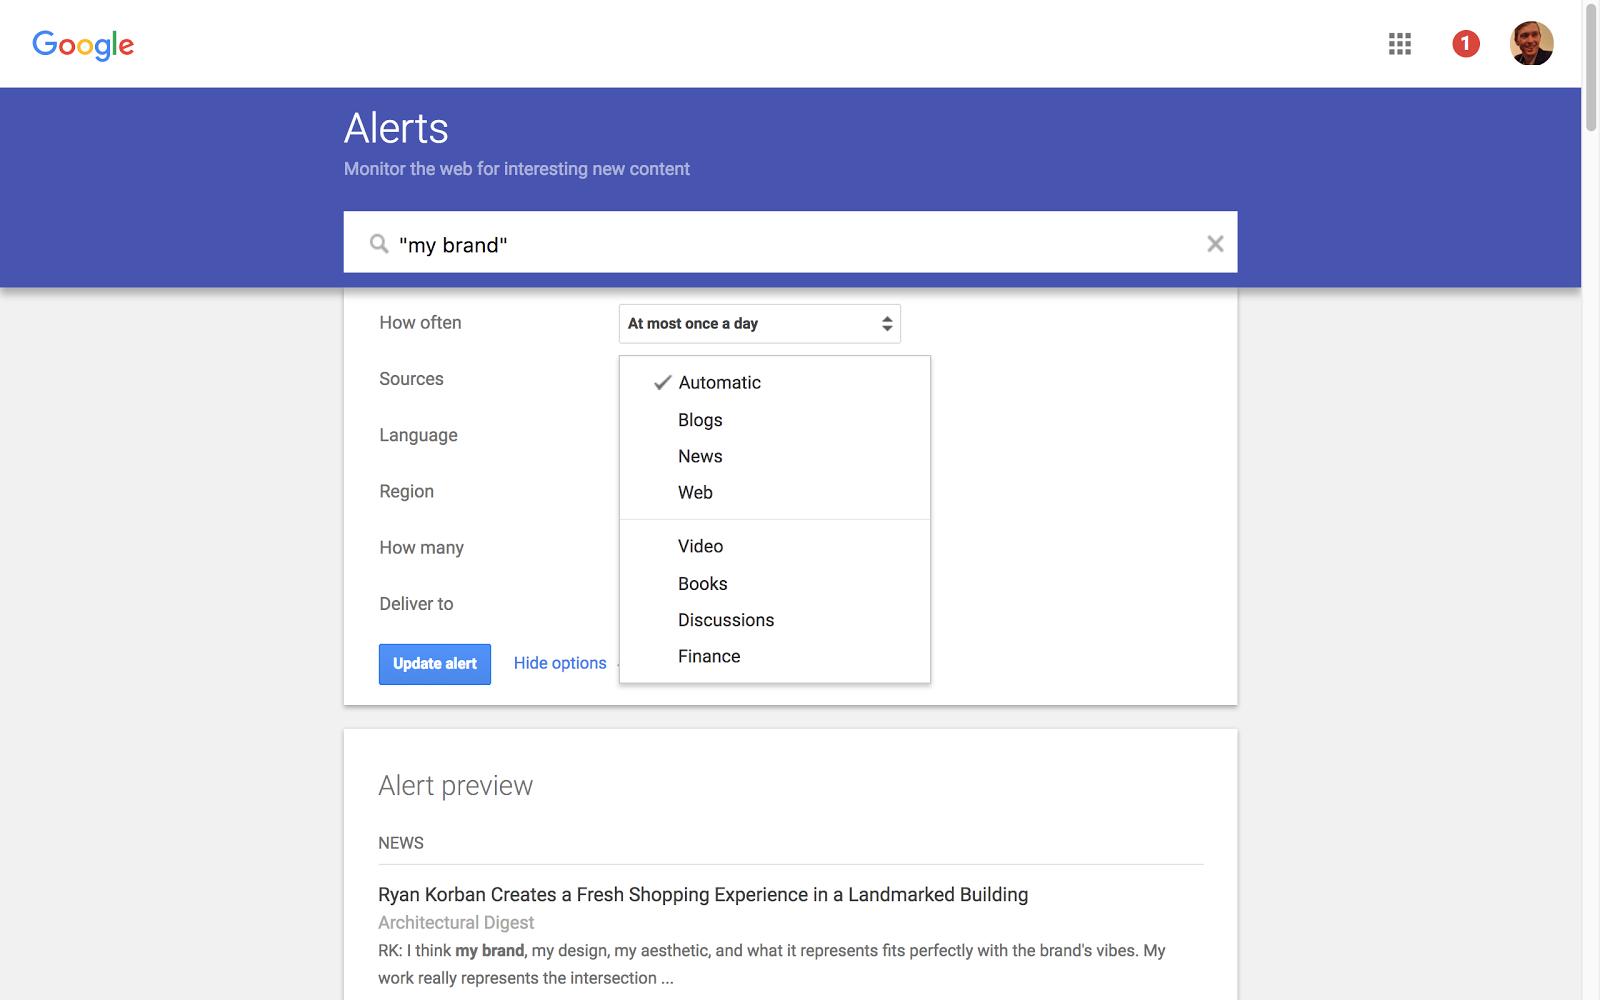 Avvisi sui motori di ricerca via e-mail